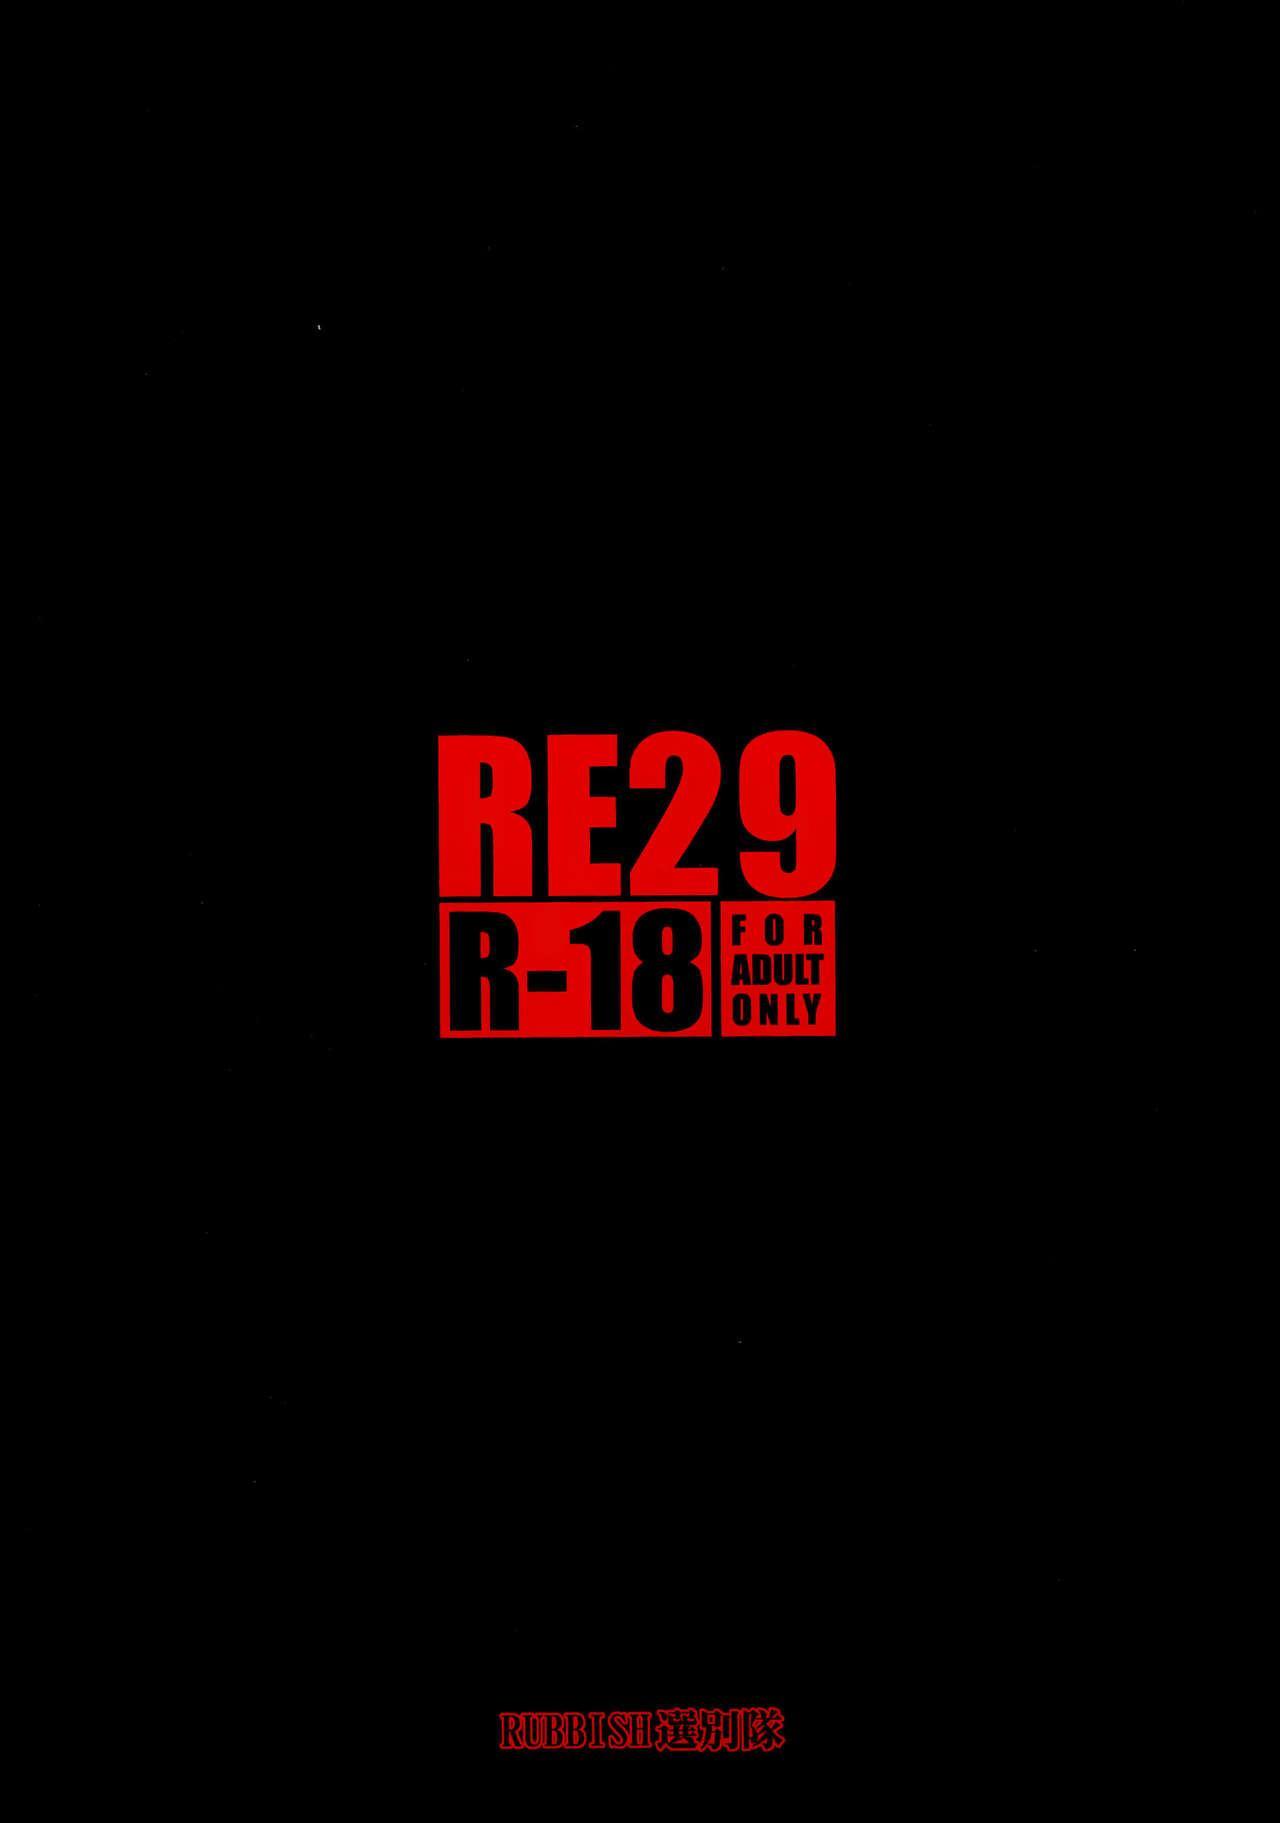 RE29 33